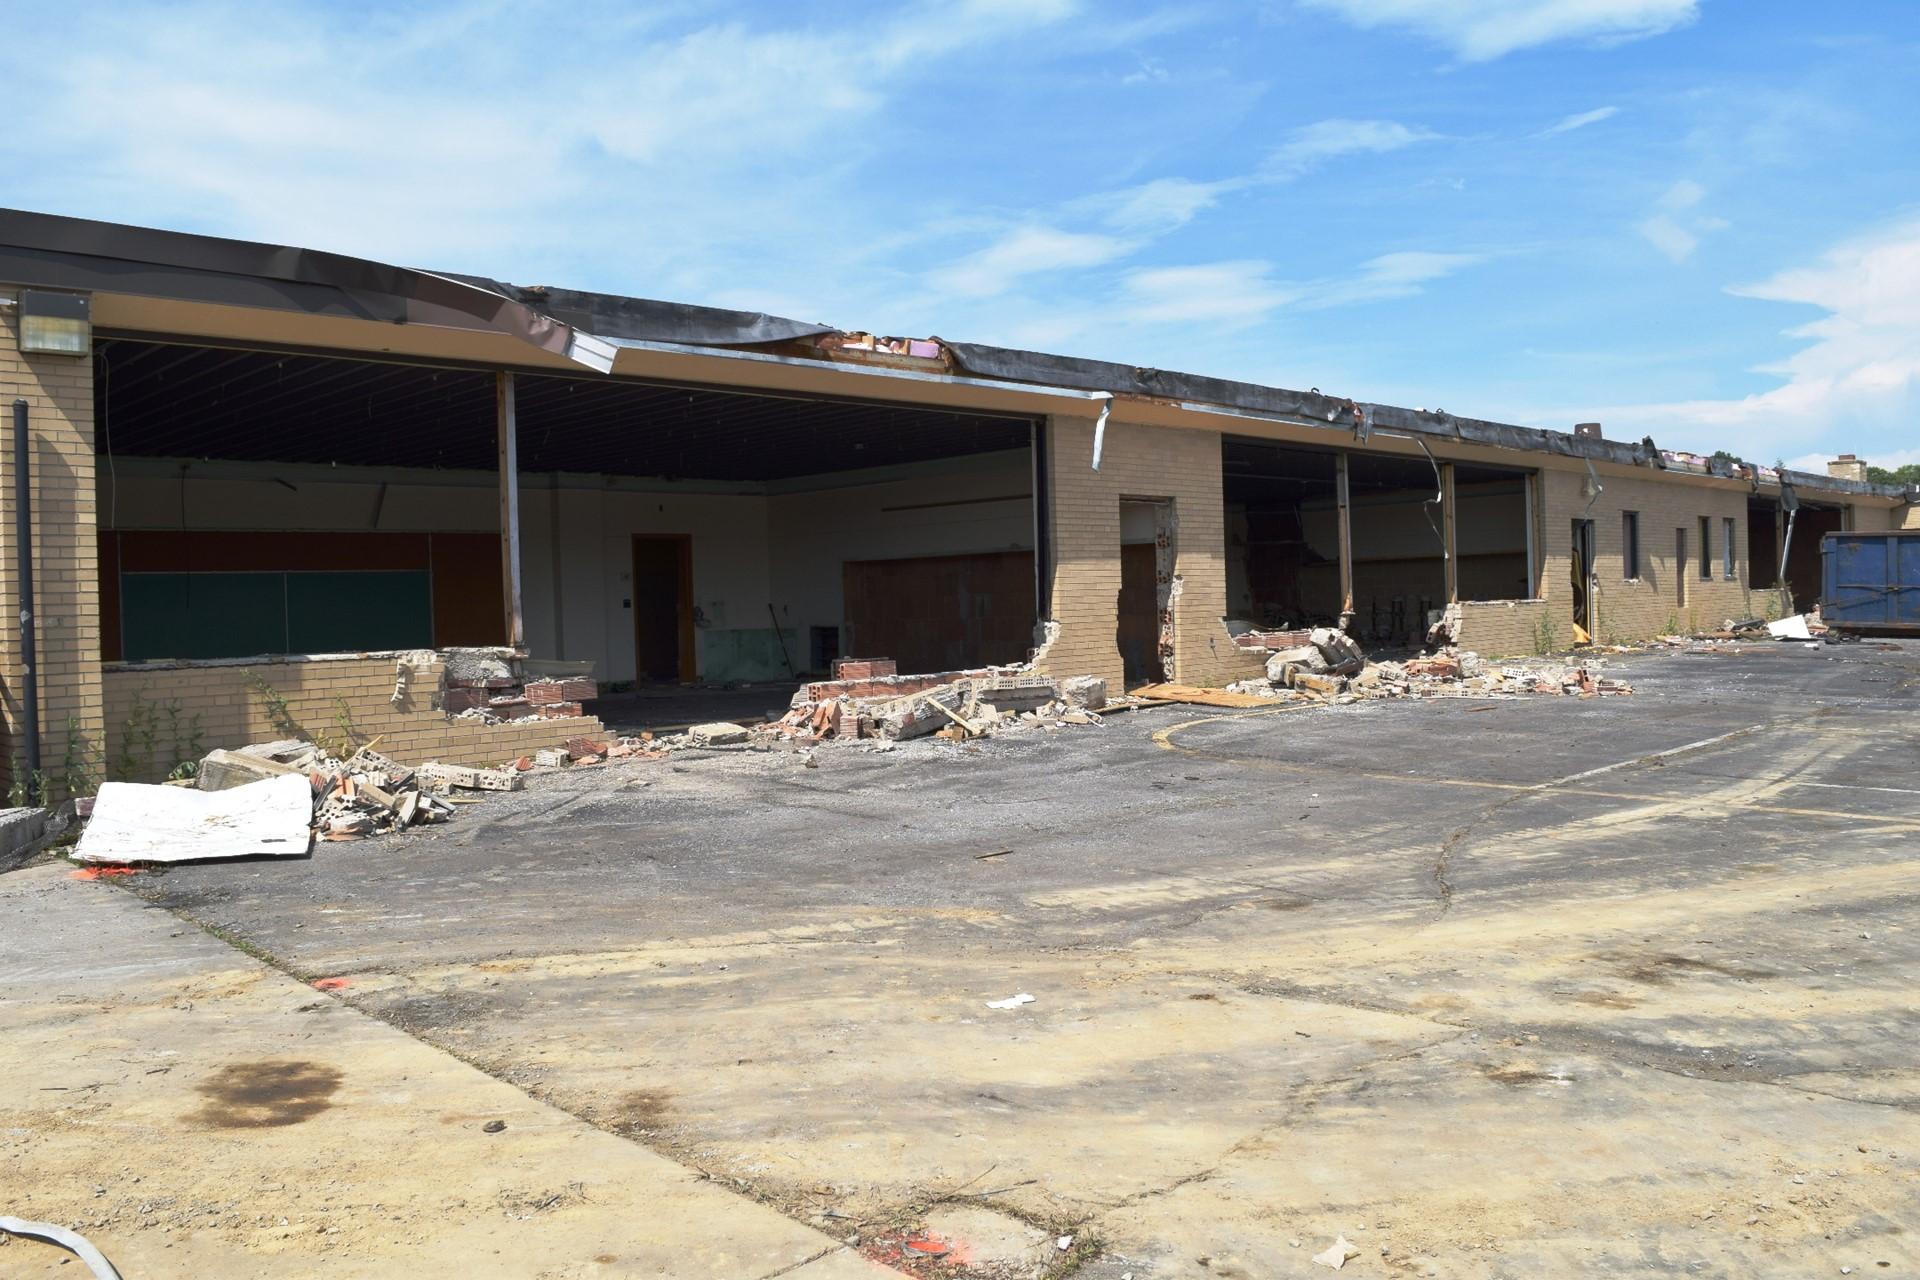 Interior demolition at Rogers Primary School: July 2016